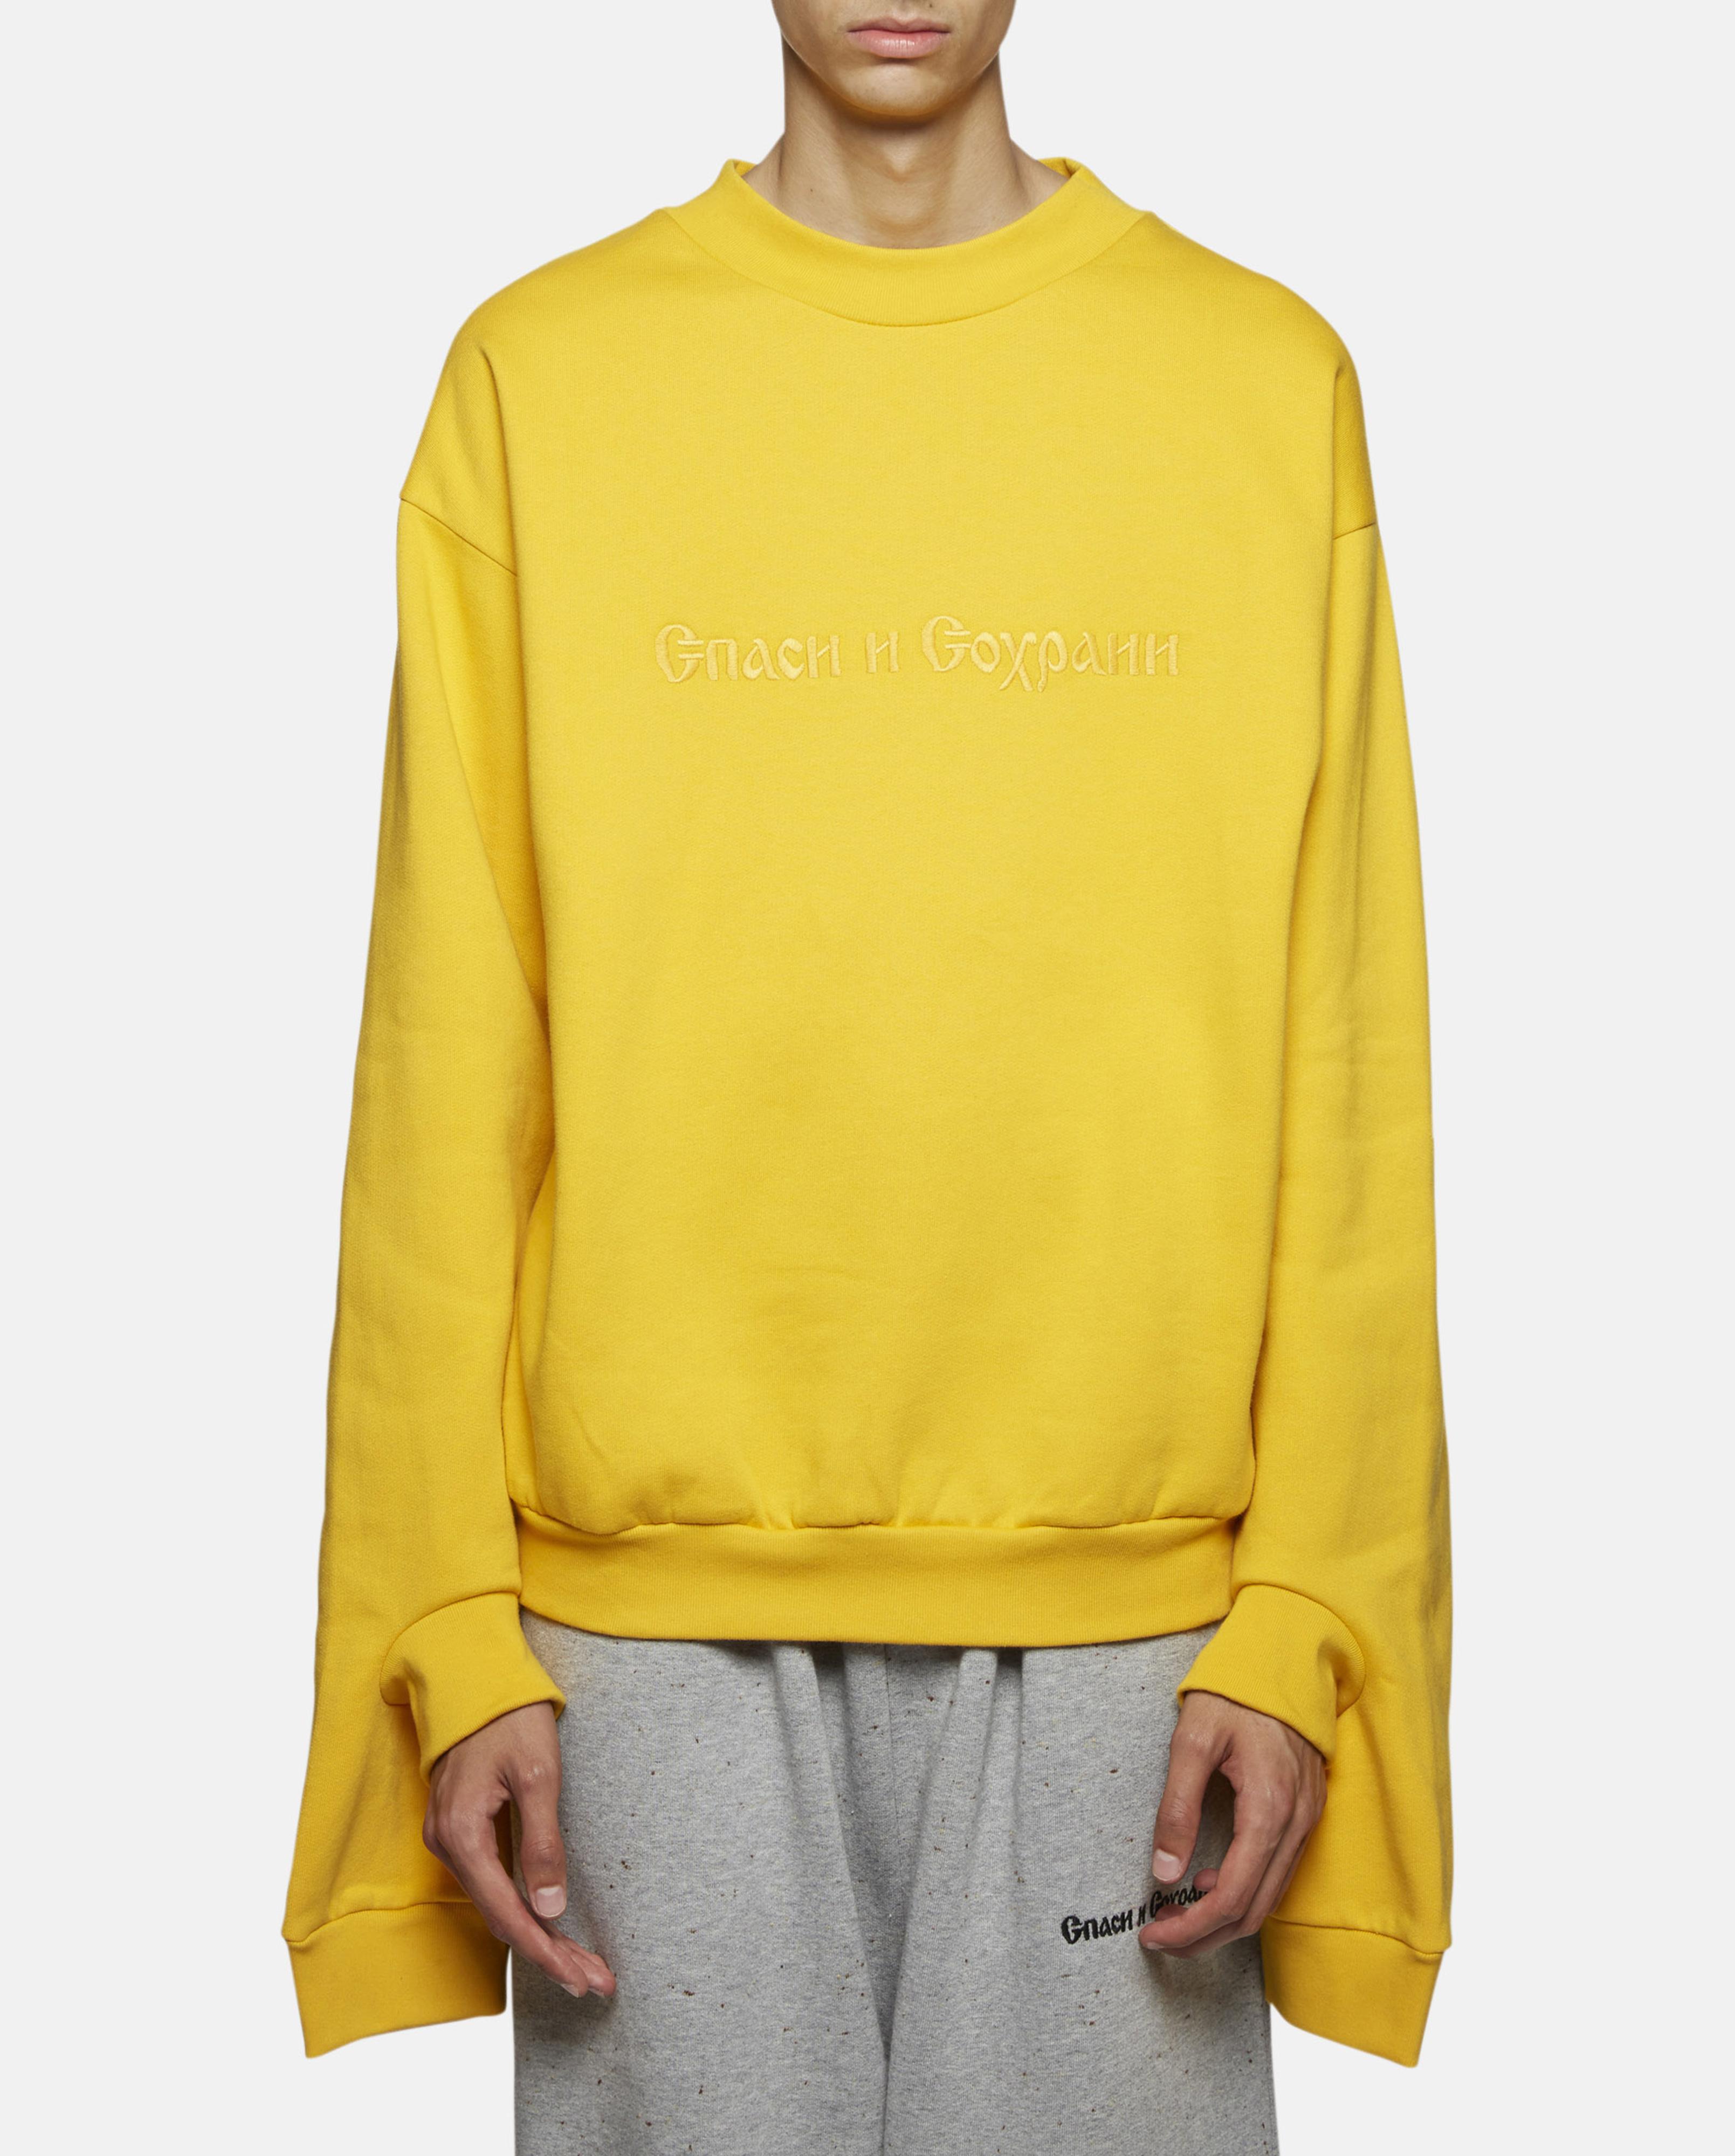 Mens Black Turtleneck Sweater